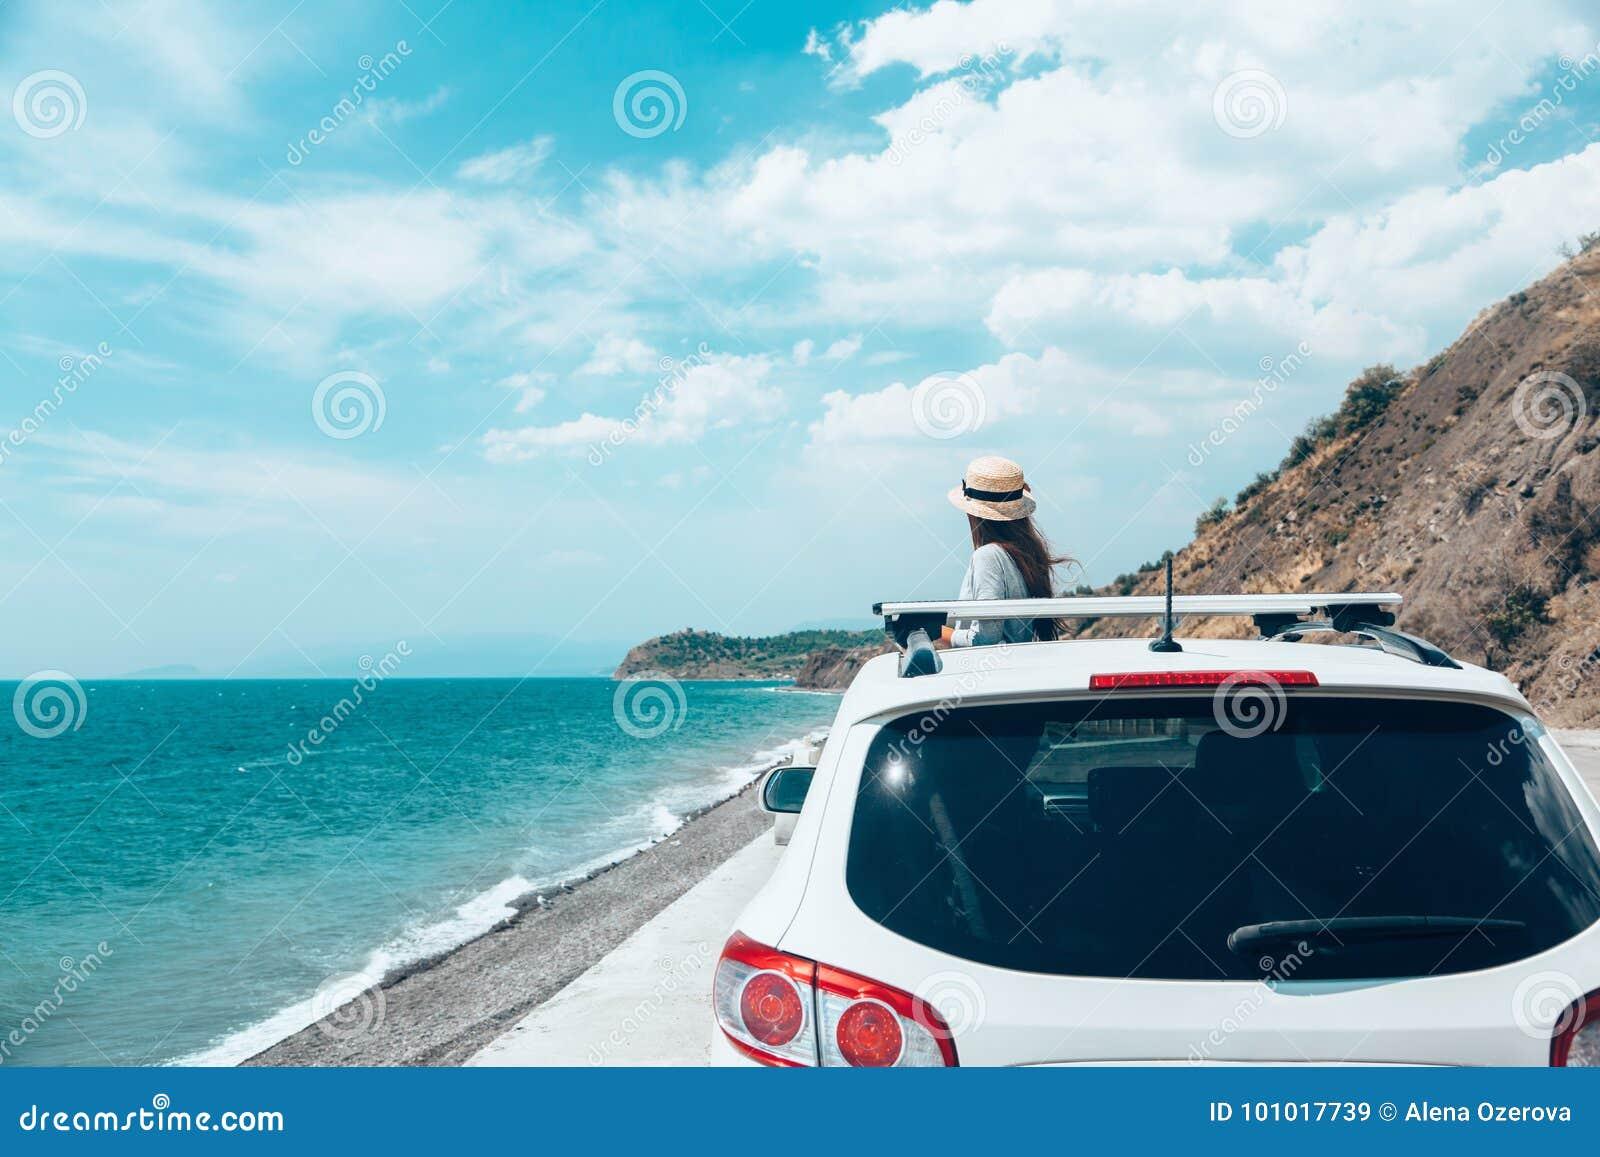 Sommer roadtrip zum Strand